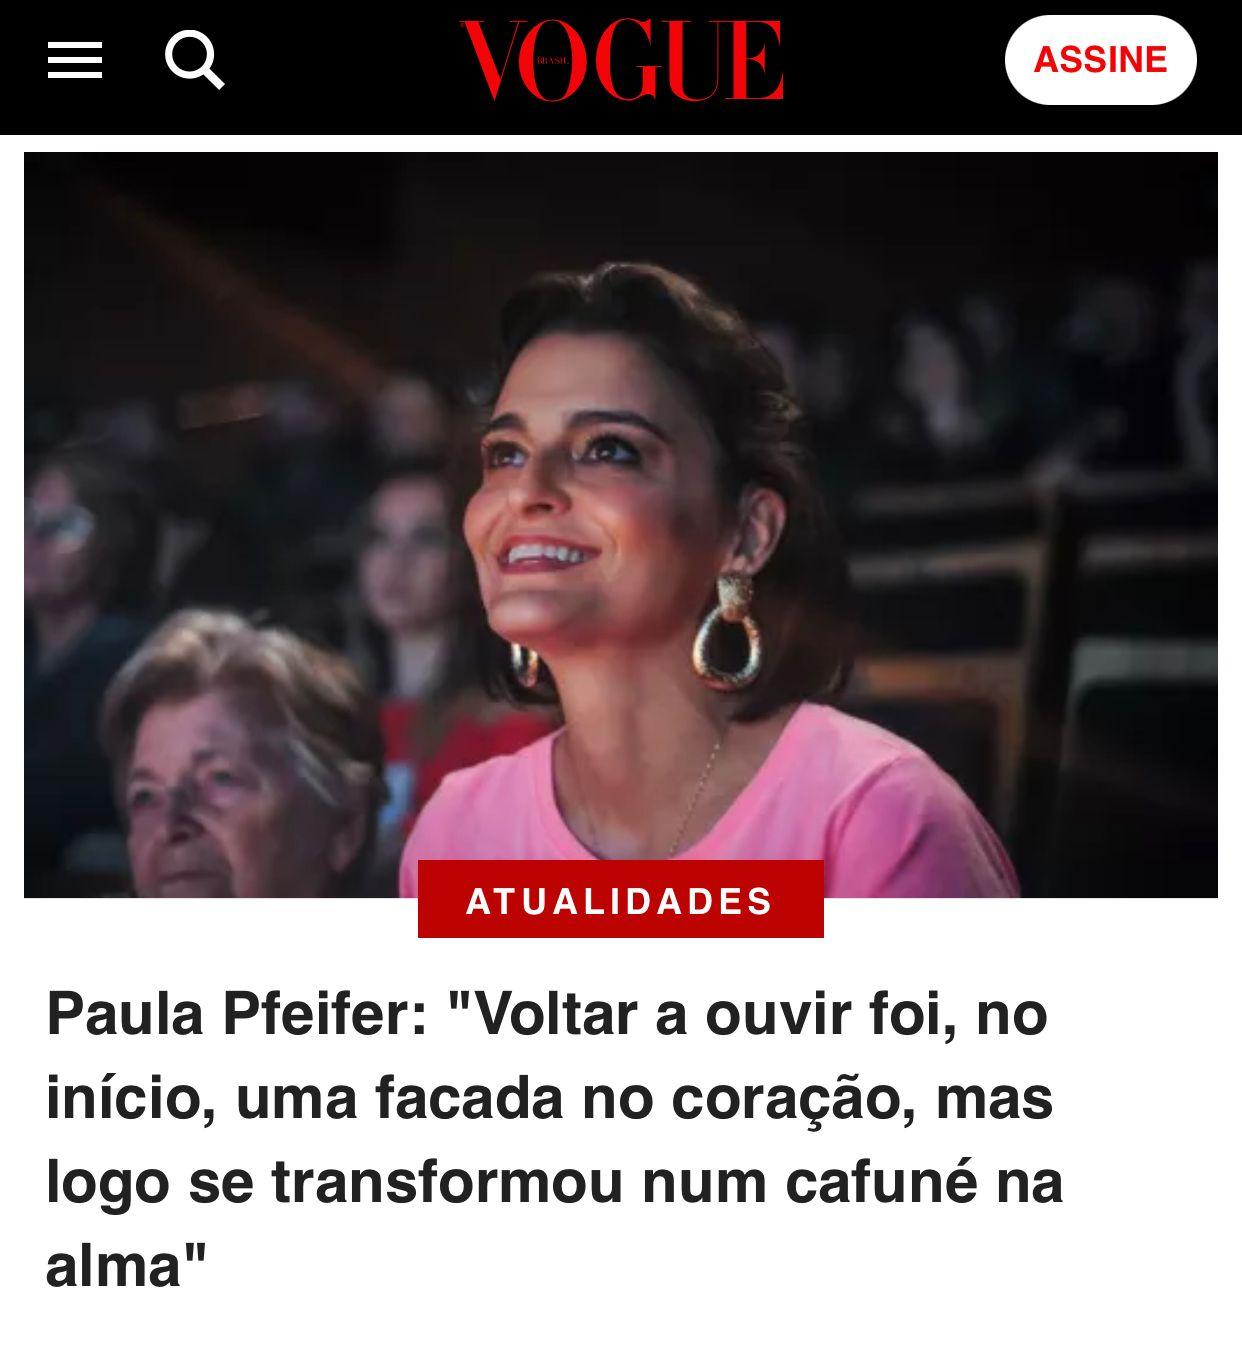 Paula Pfeifer Vogue Brasil